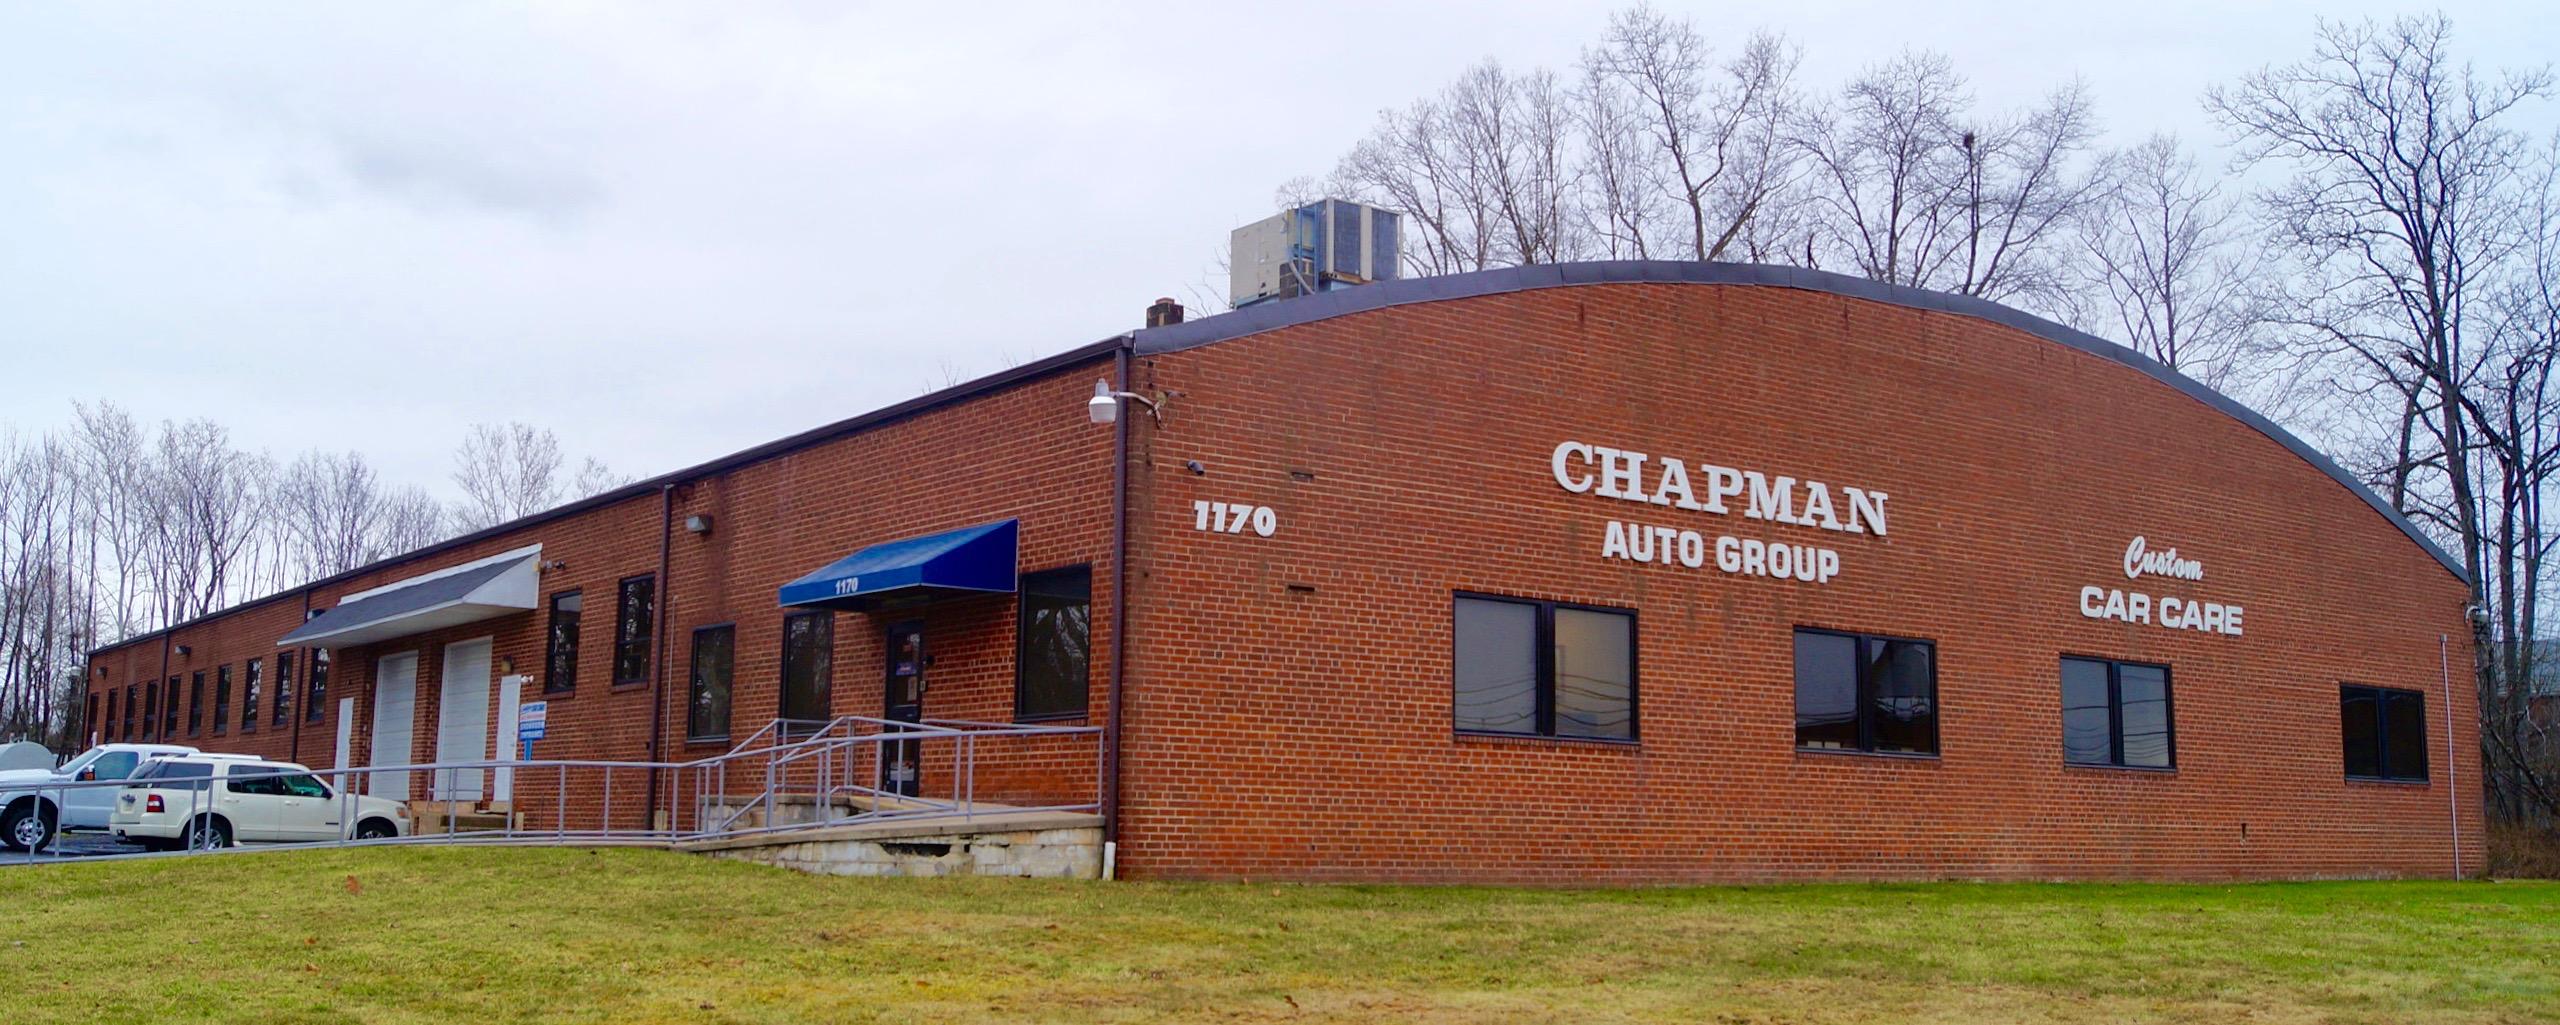 Chapman Auto Group